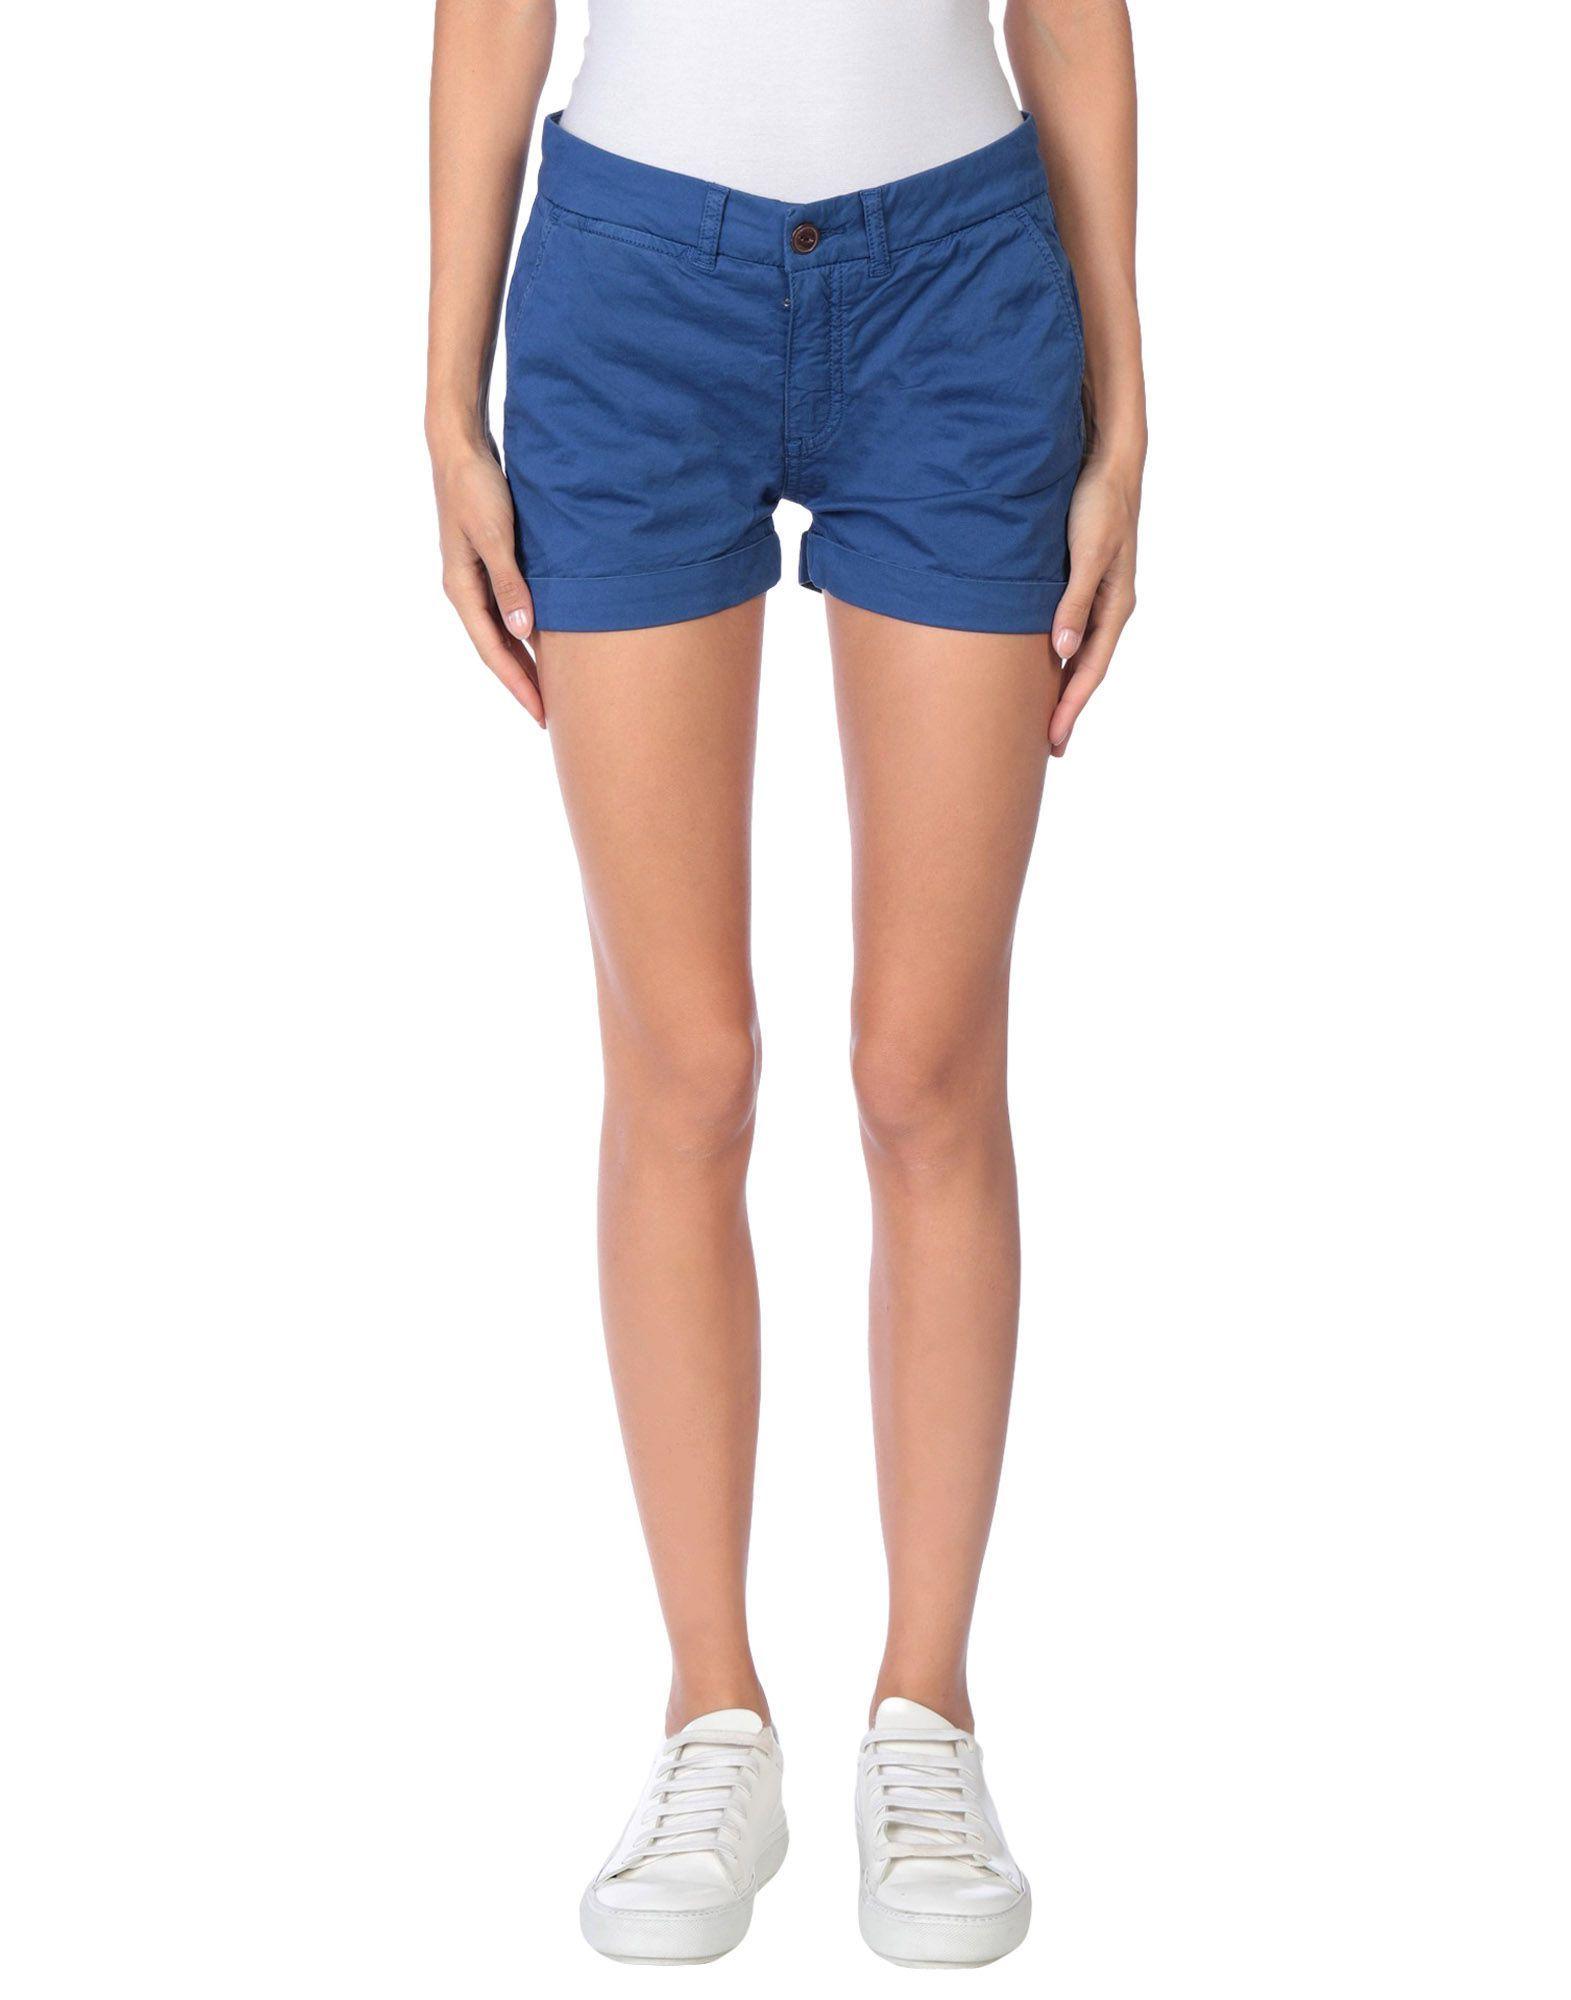 Franklin & Marshall Blue Cotton Shorts